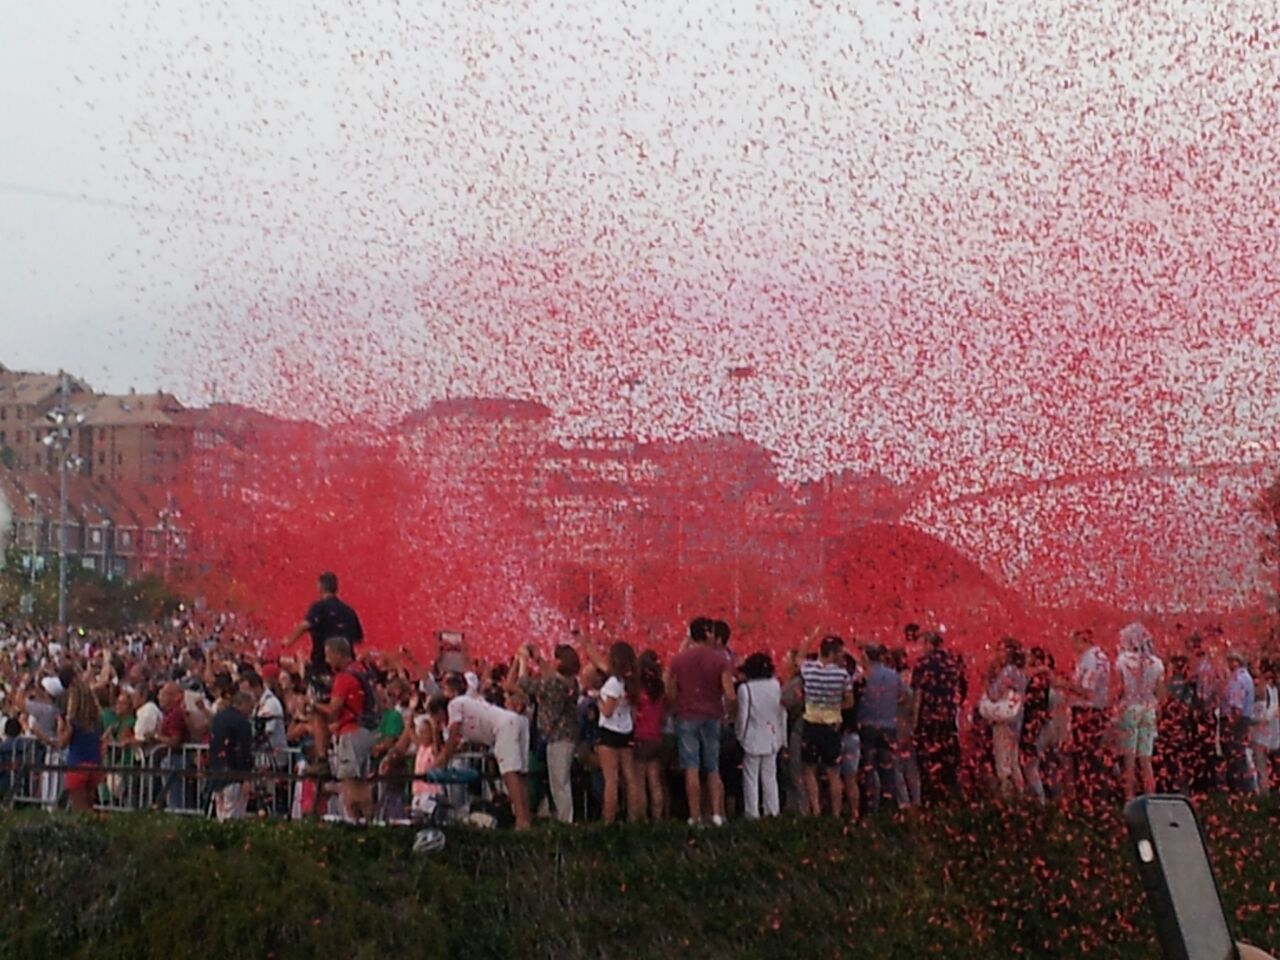 inauguracion-mundia-vela-santander-2014-confeti